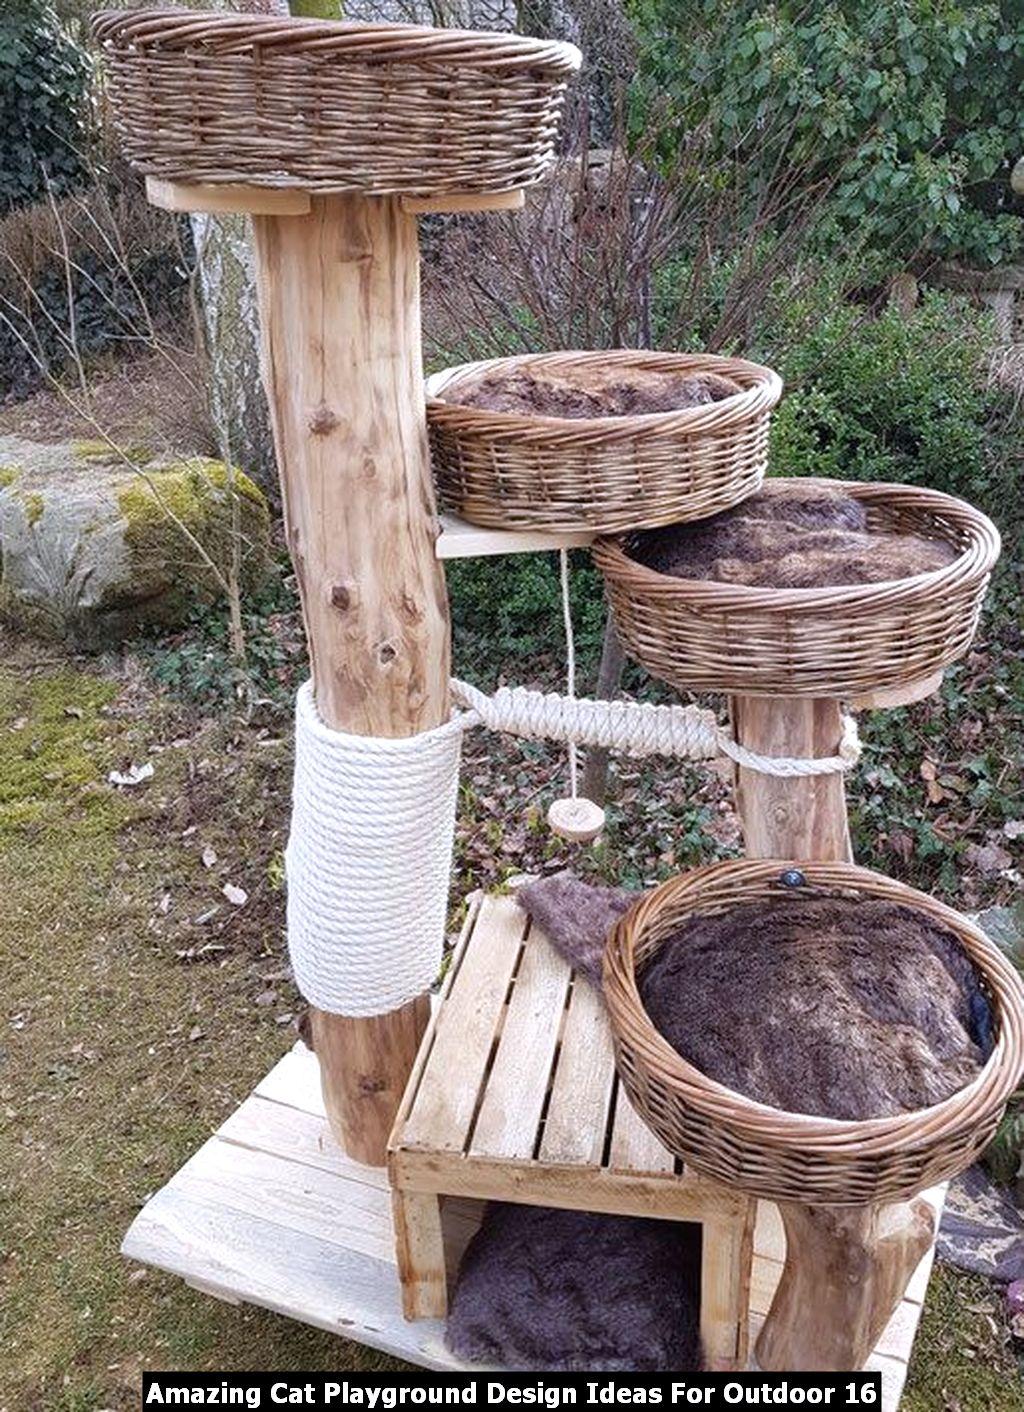 Amazing Cat Playground Design Ideas For Outdoor 16